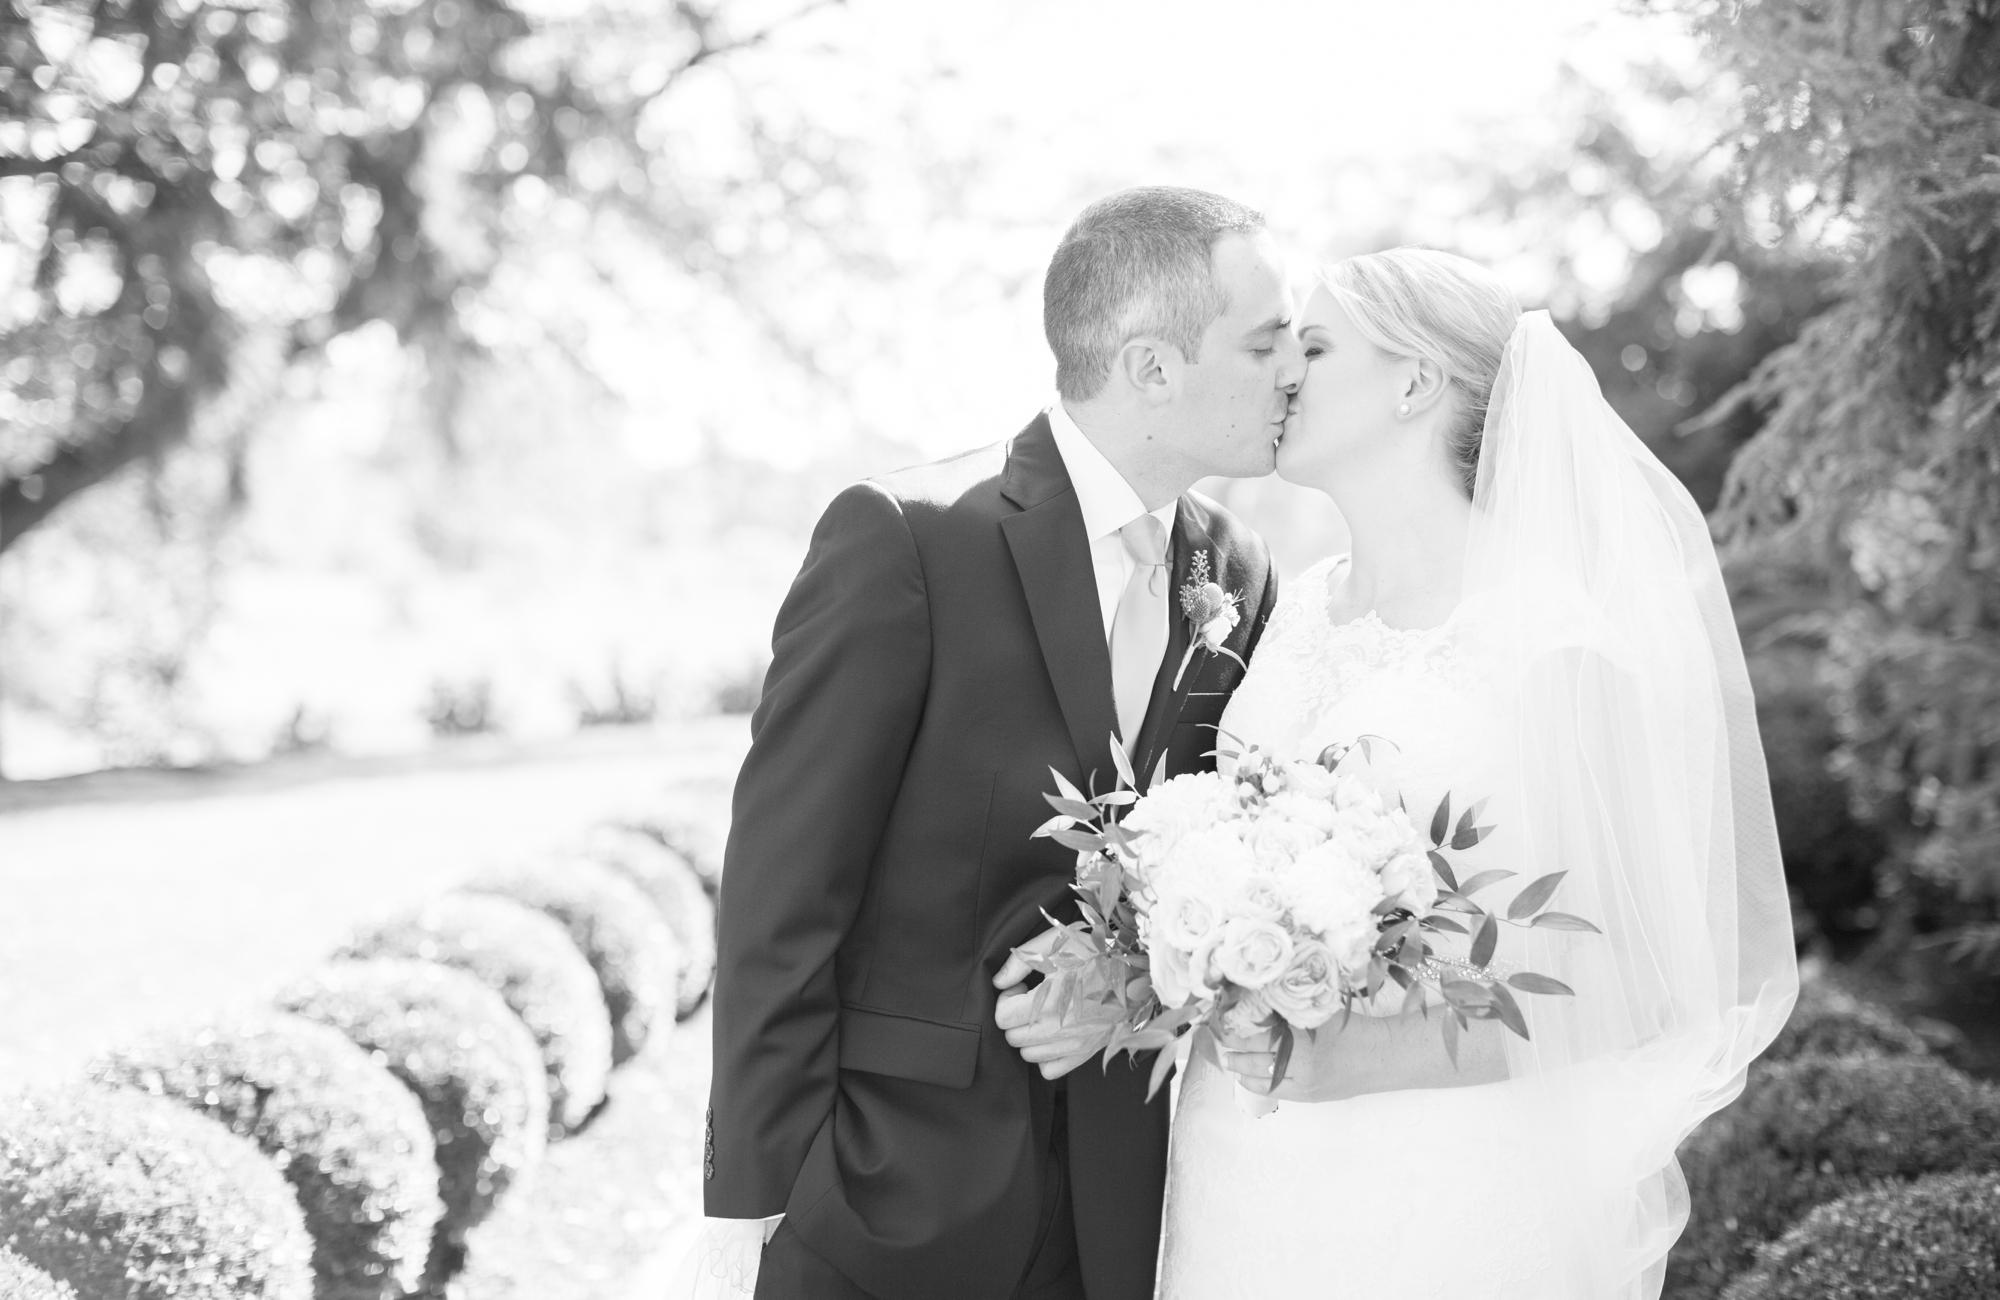 3-Miano Wedding Bride & Groom Portraits-330_anna grace photography maryland wedding photographer rockland estates.jpg